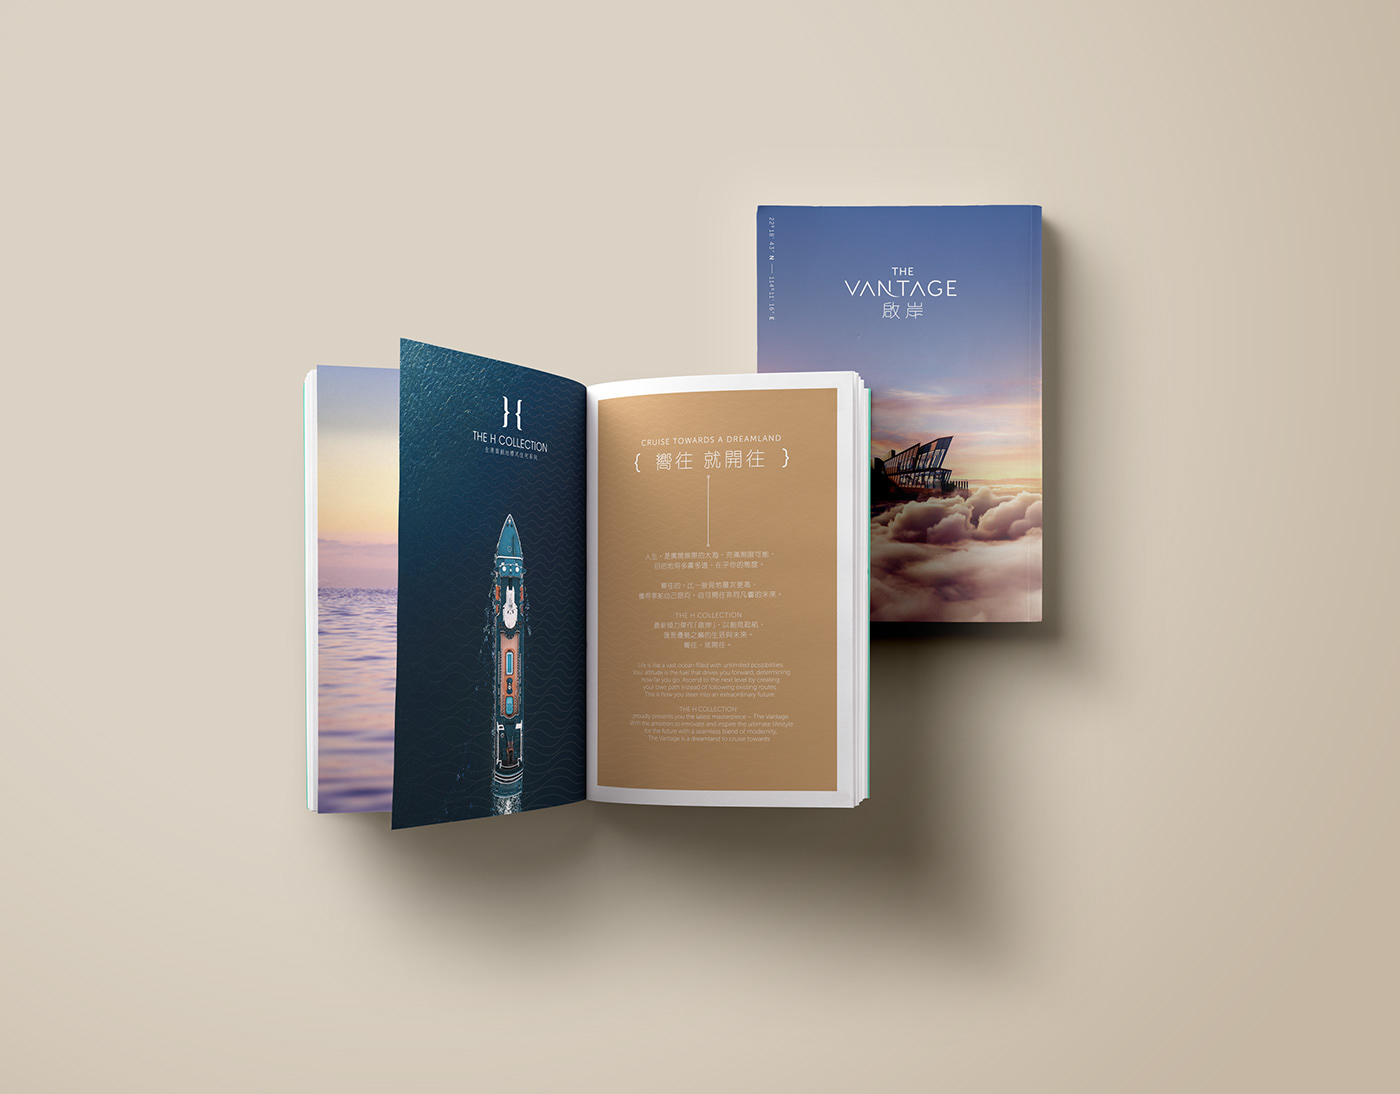 Image may contain: book, wall and print